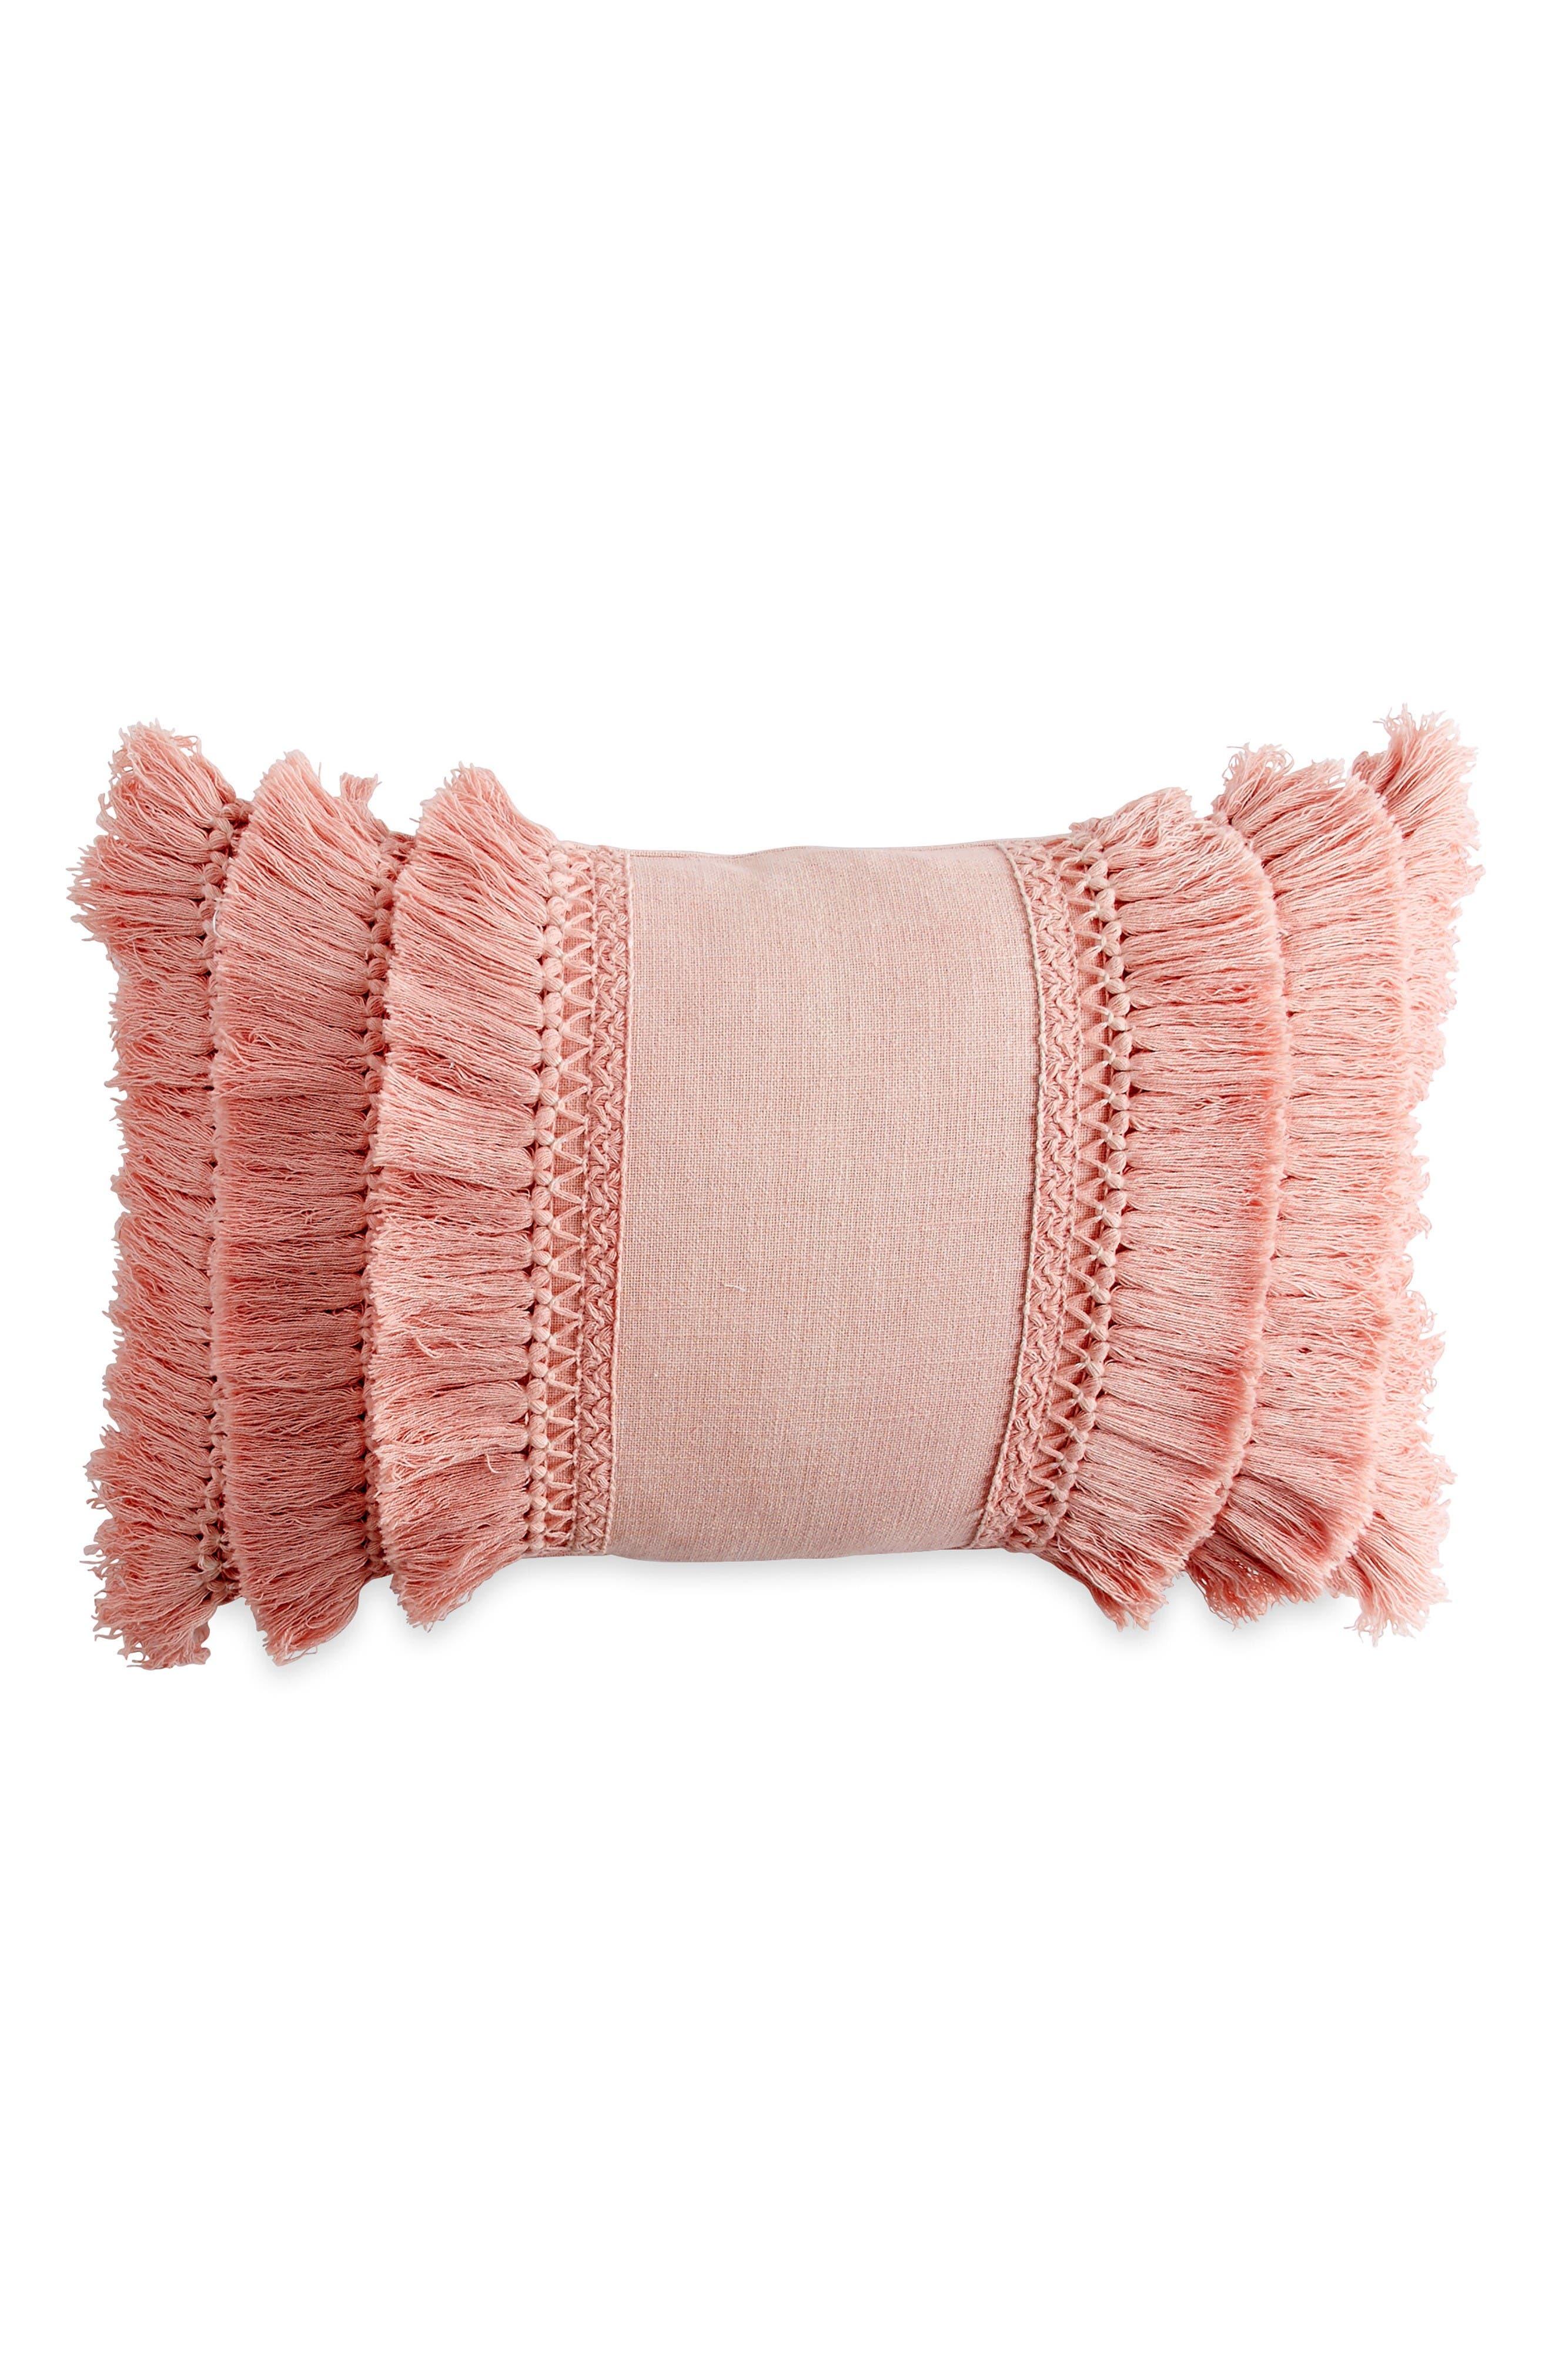 Alternate Image 1 Selected - Peri Home Fringe Pillow